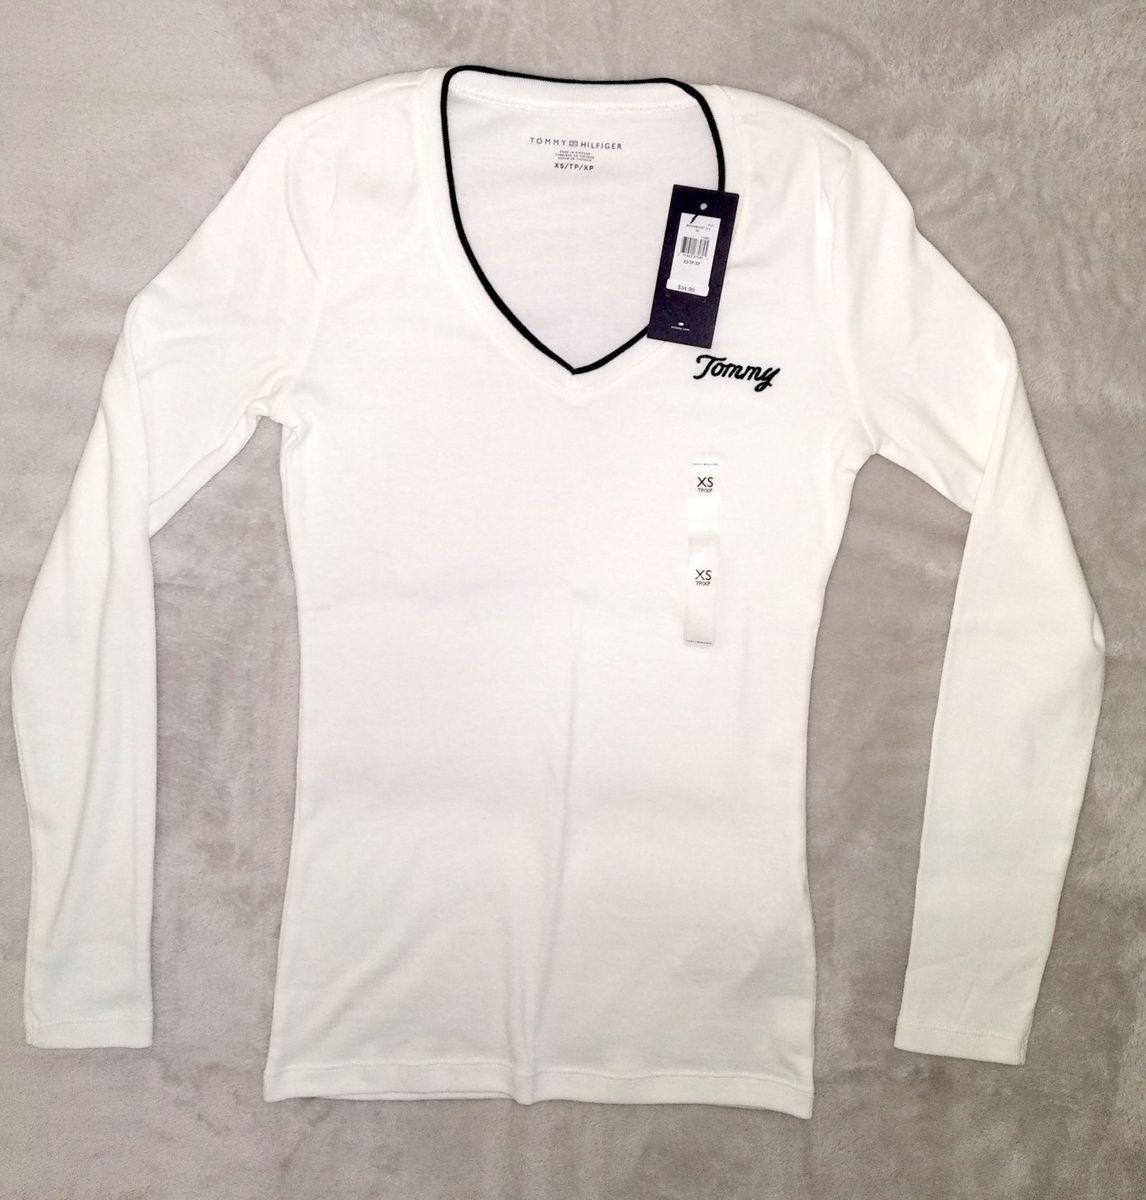 83e4f26d82f01 camiseta feminina tommy hilfiger básica lisa manga longa decote v -  camisetas tommy hilfiger